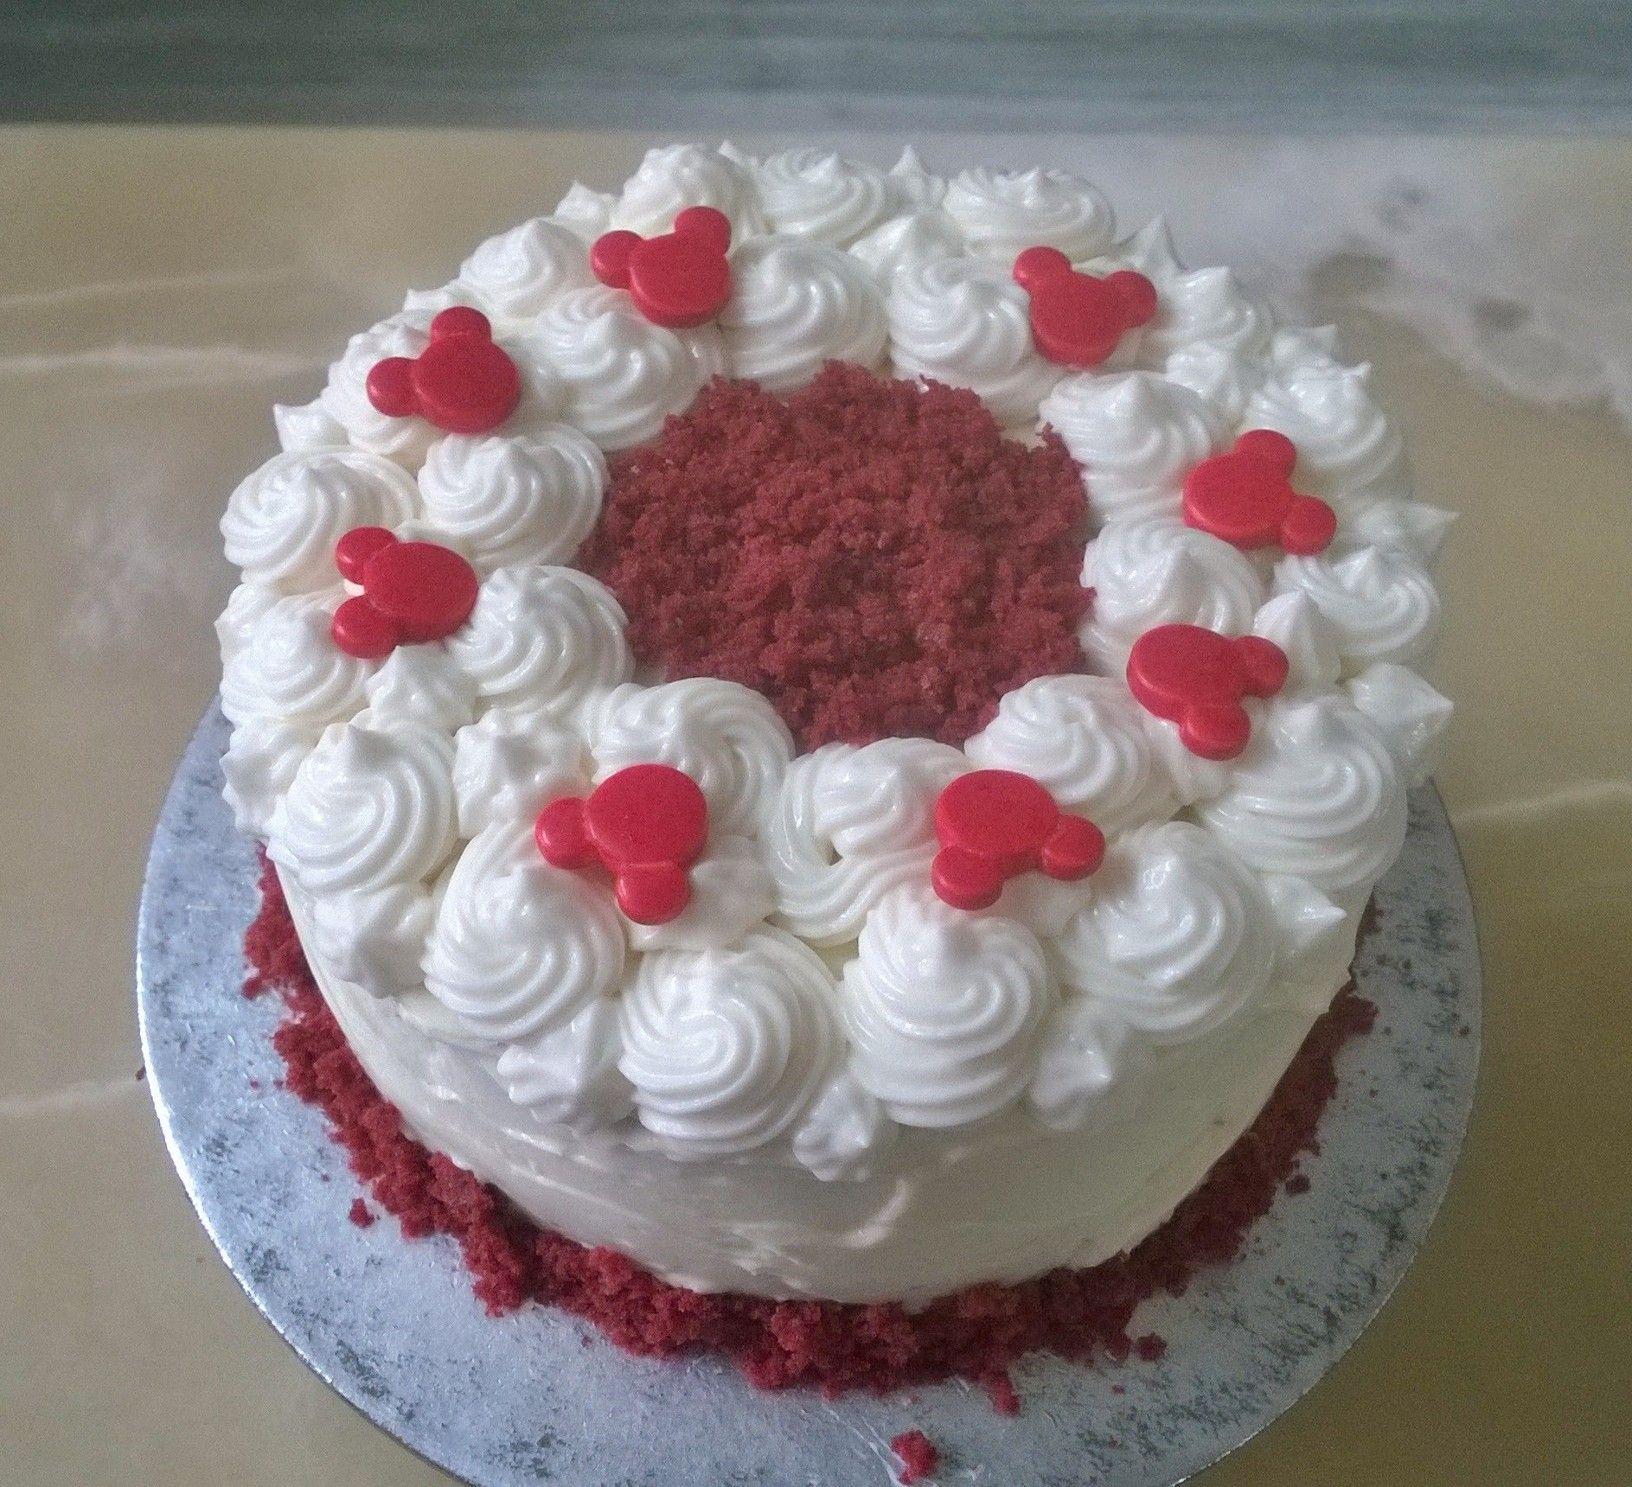 Token Of Appreciation Red Velvet Cakes Joy Of Baking Recipe 27 8 16 Cupcake Cakes Cake Decorating Cake